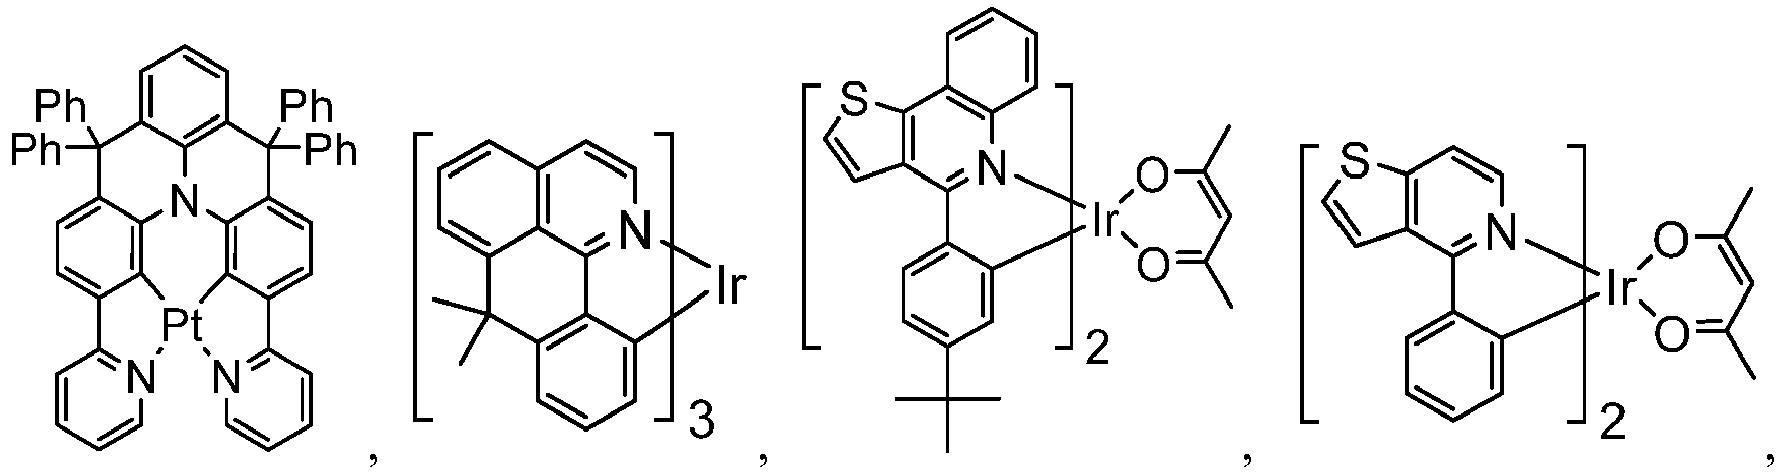 Figure imgb0924